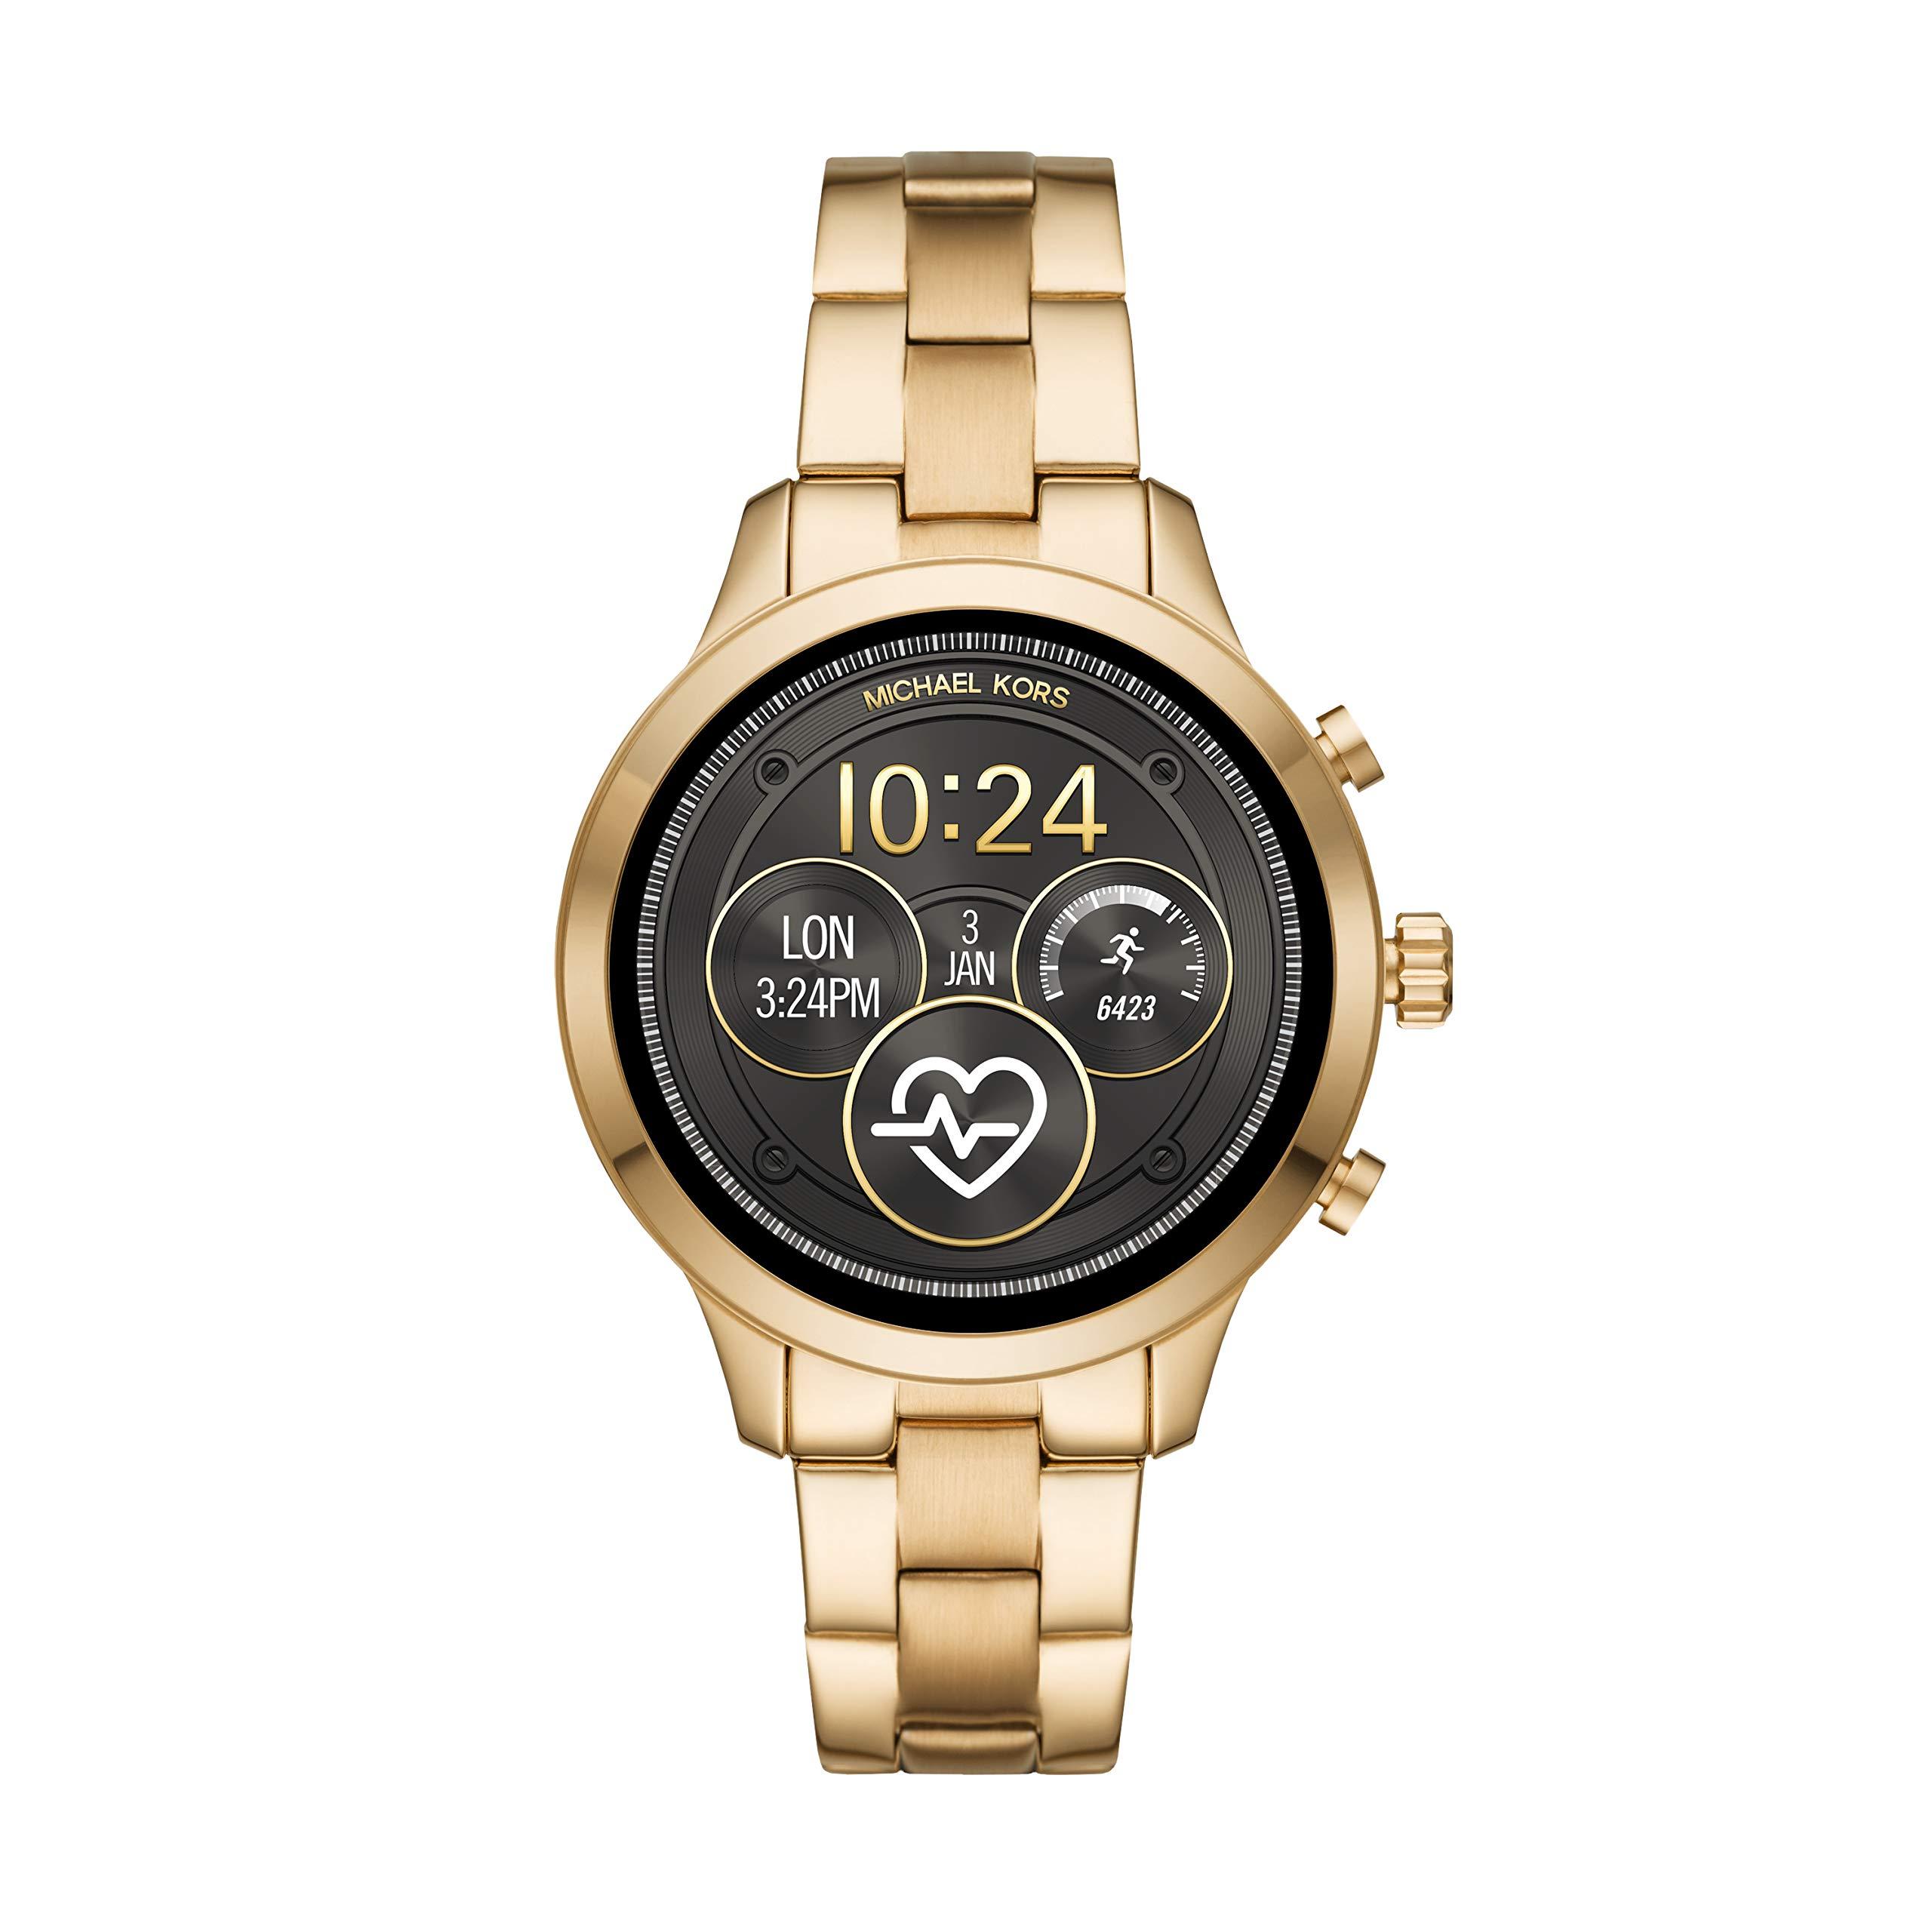 Michael-Kors-Damen-Digital-Smart-Watch-Armbanduhr-mit-Edelstahl-Armband-MKT5045